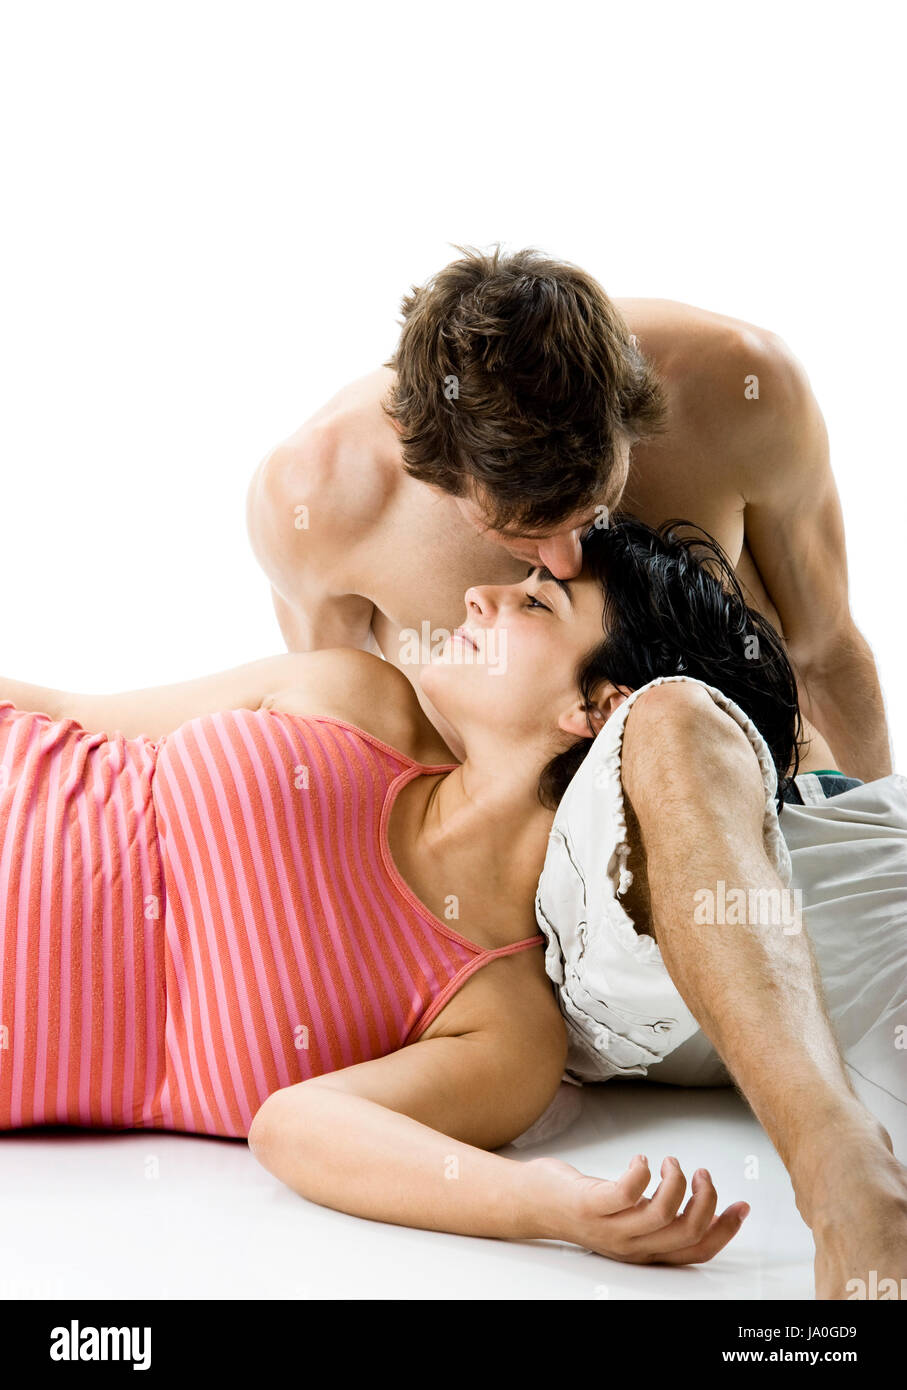 Woman Beautiful Beauteously Nice Romantic Pregnancy Pregnant Stock Photo Alamy